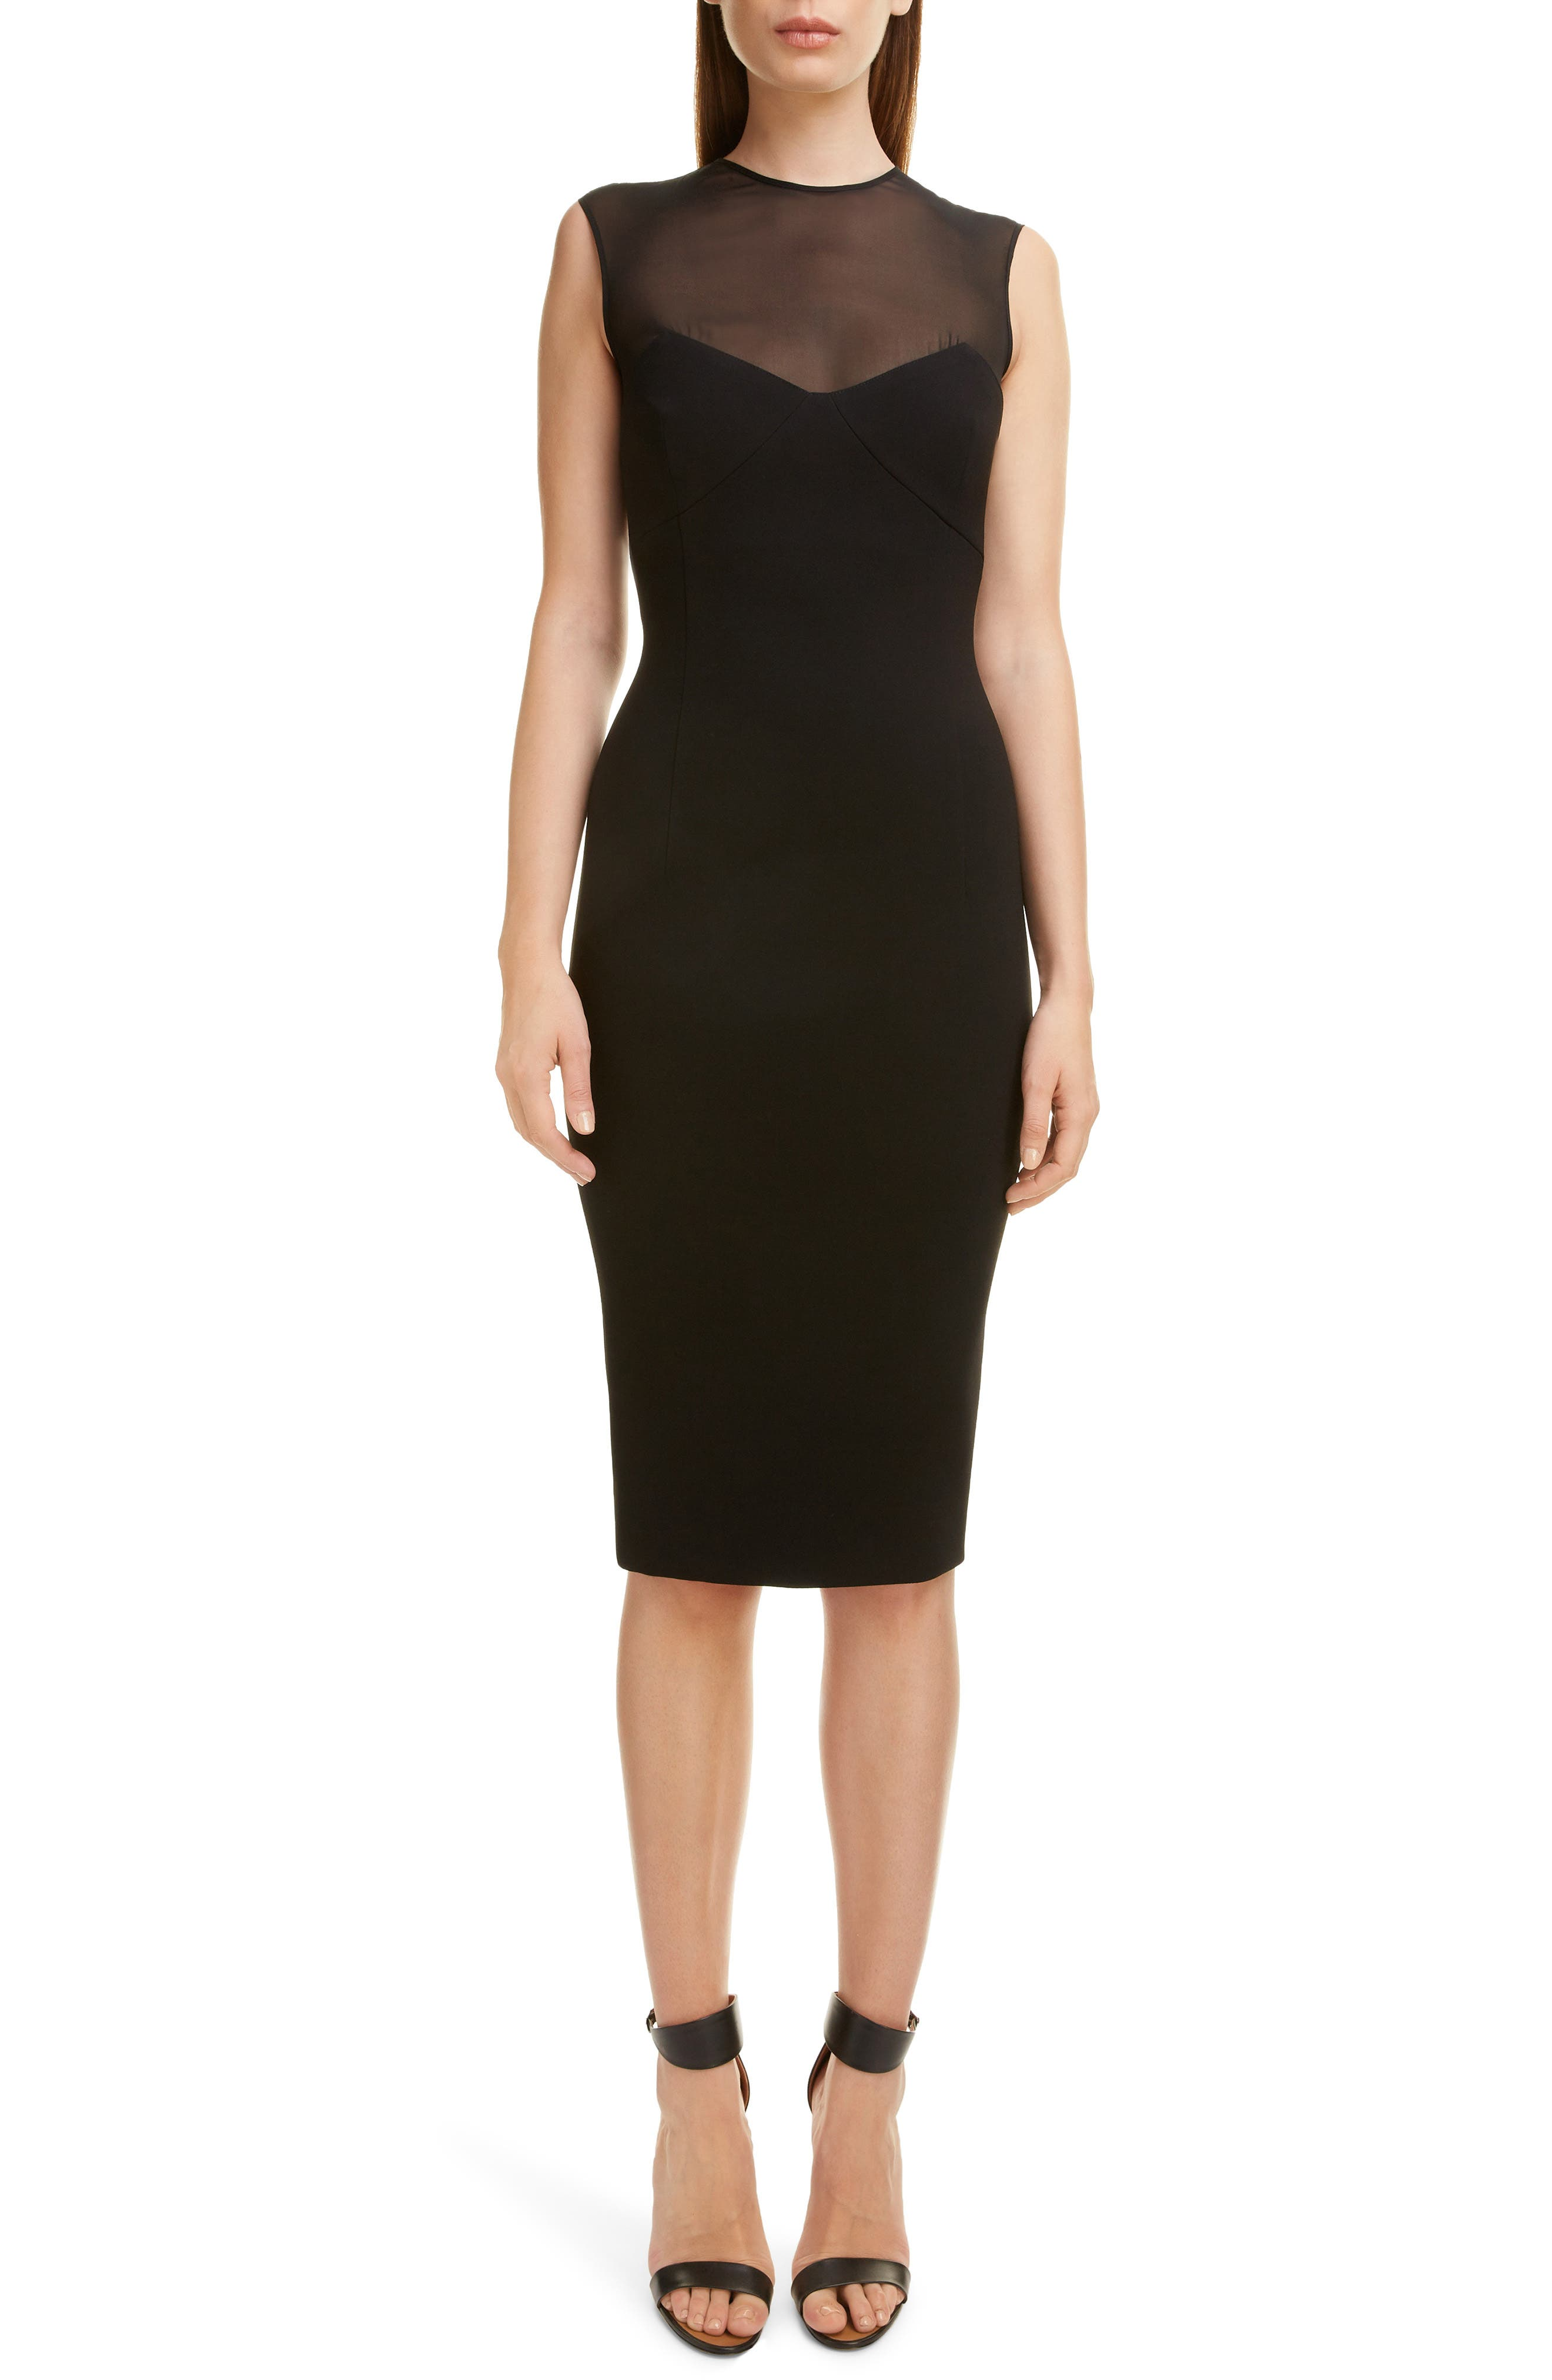 VICTORIA BECKHAM, Sheer Yoke Sheath Dress, Main thumbnail 1, color, BLACK